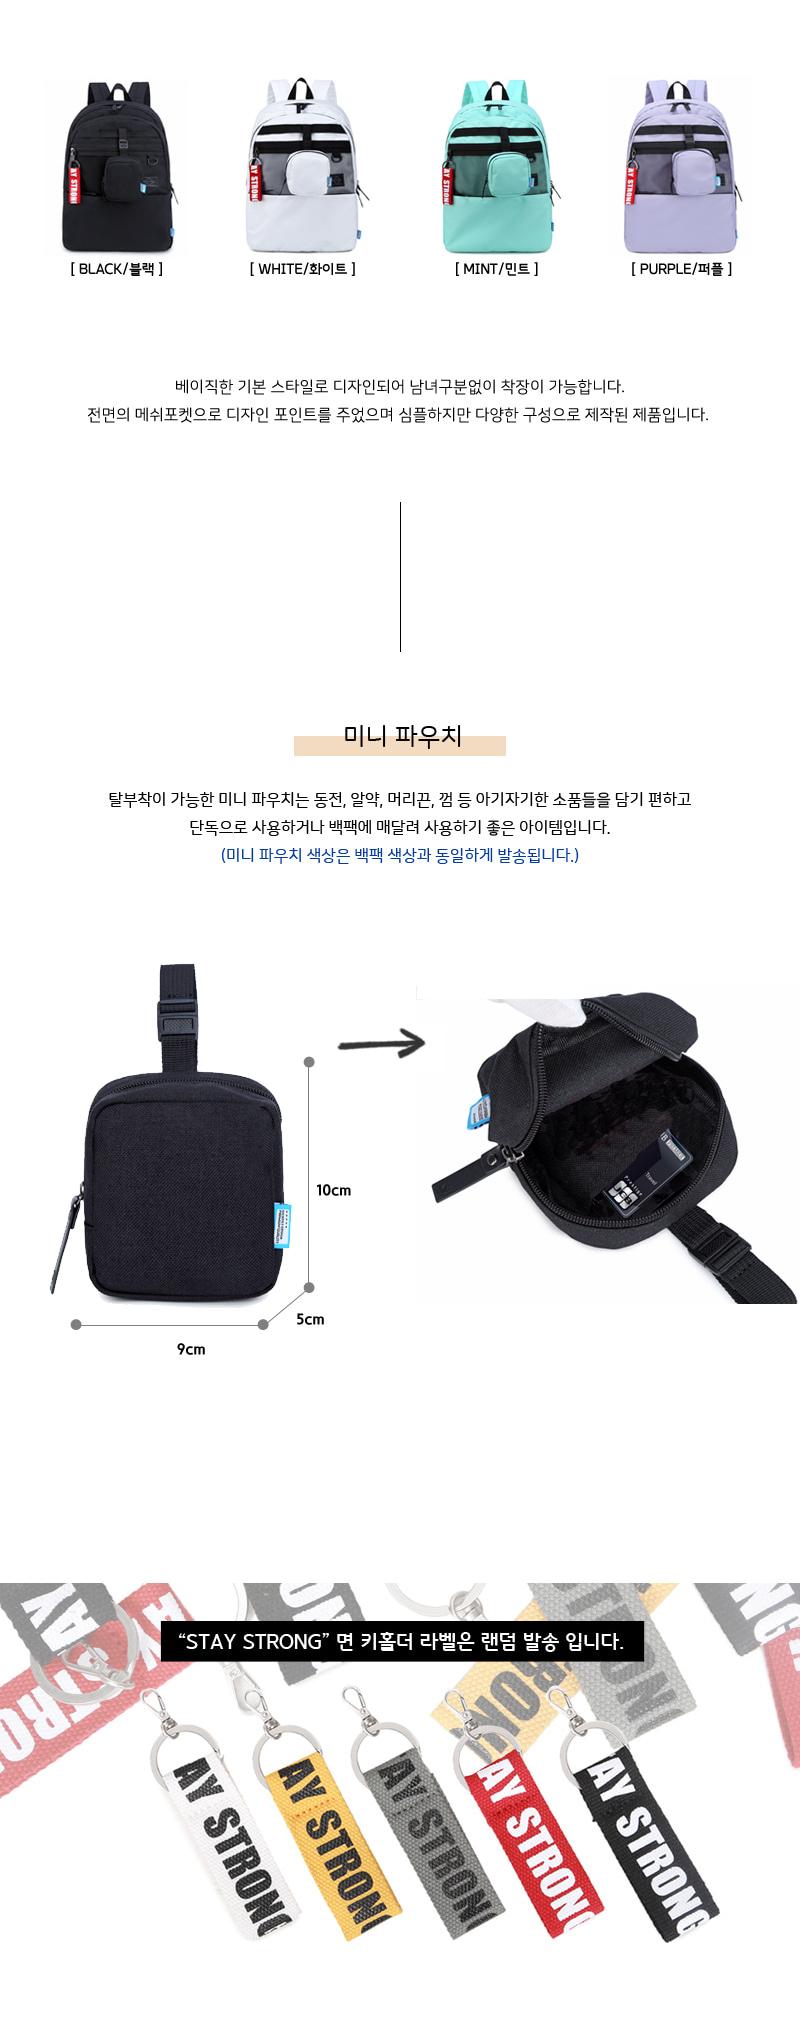 RB tutu backpack with key holder ♡